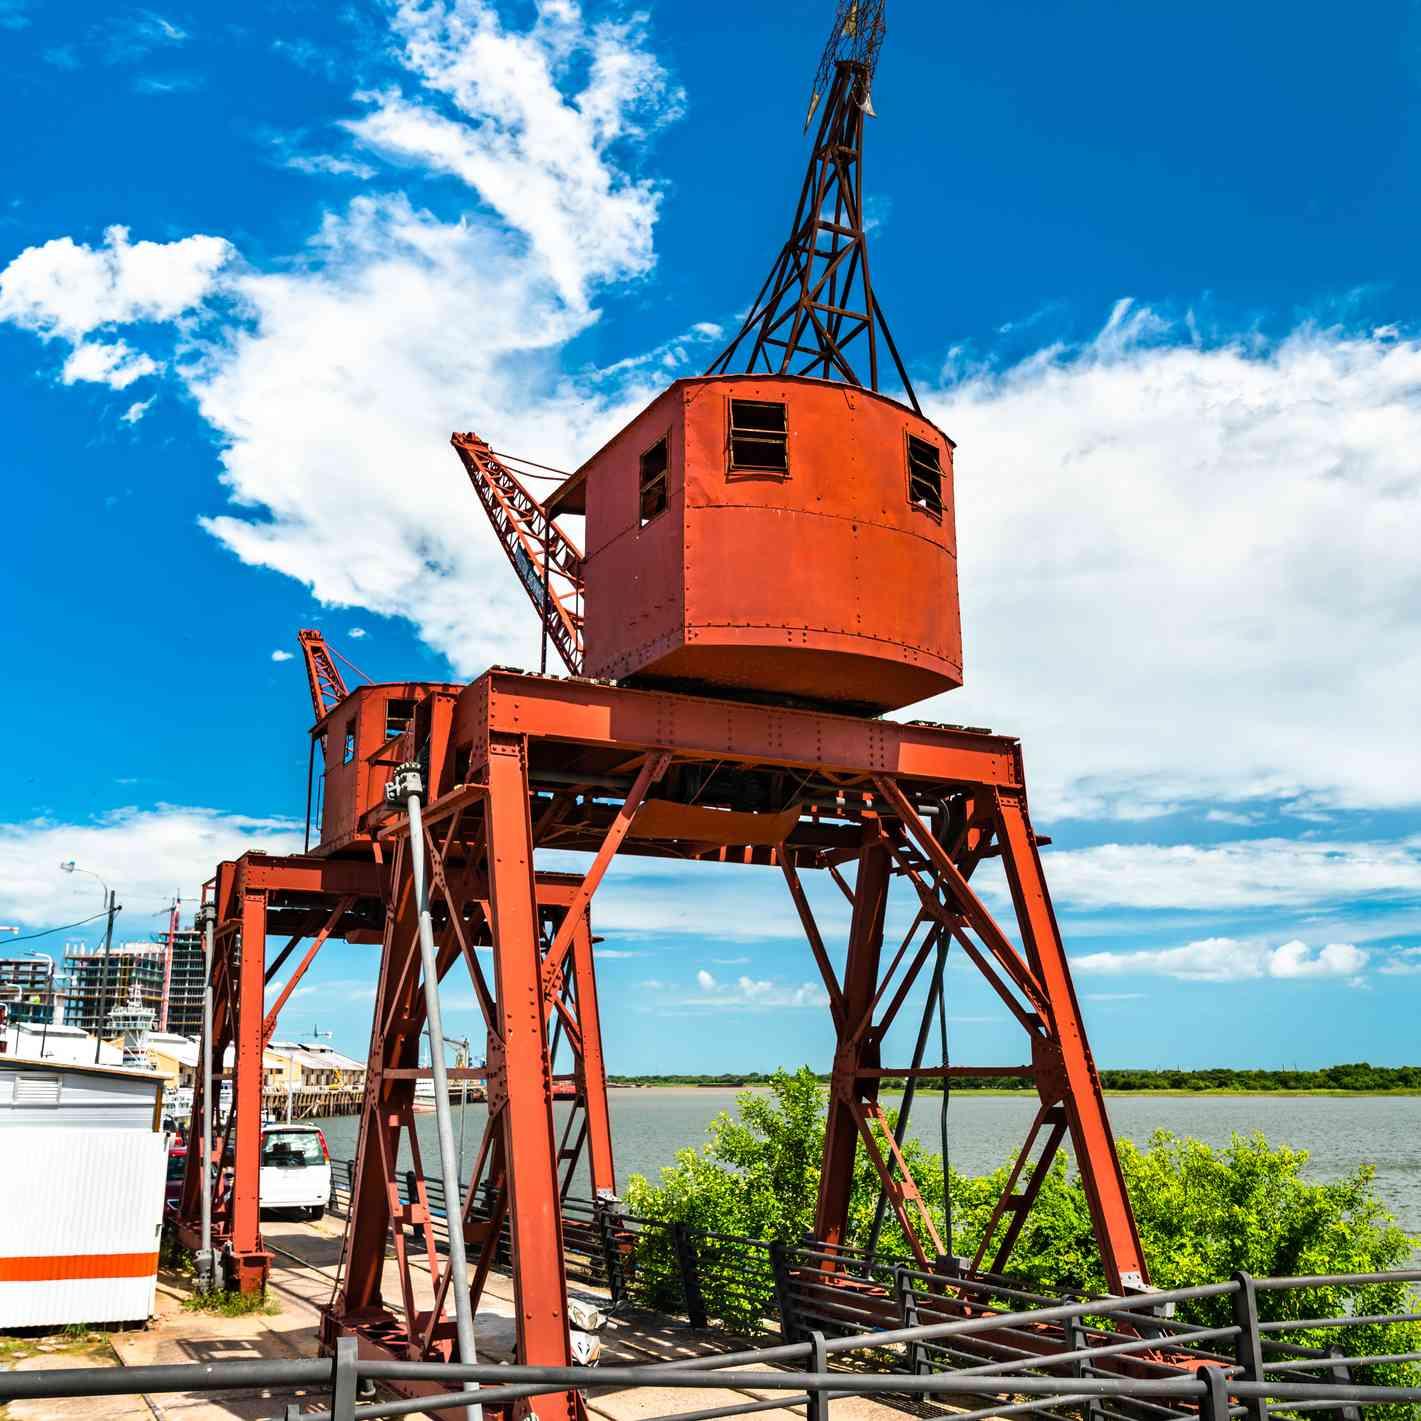 Two cranes at Asuncion river port in Paraguay